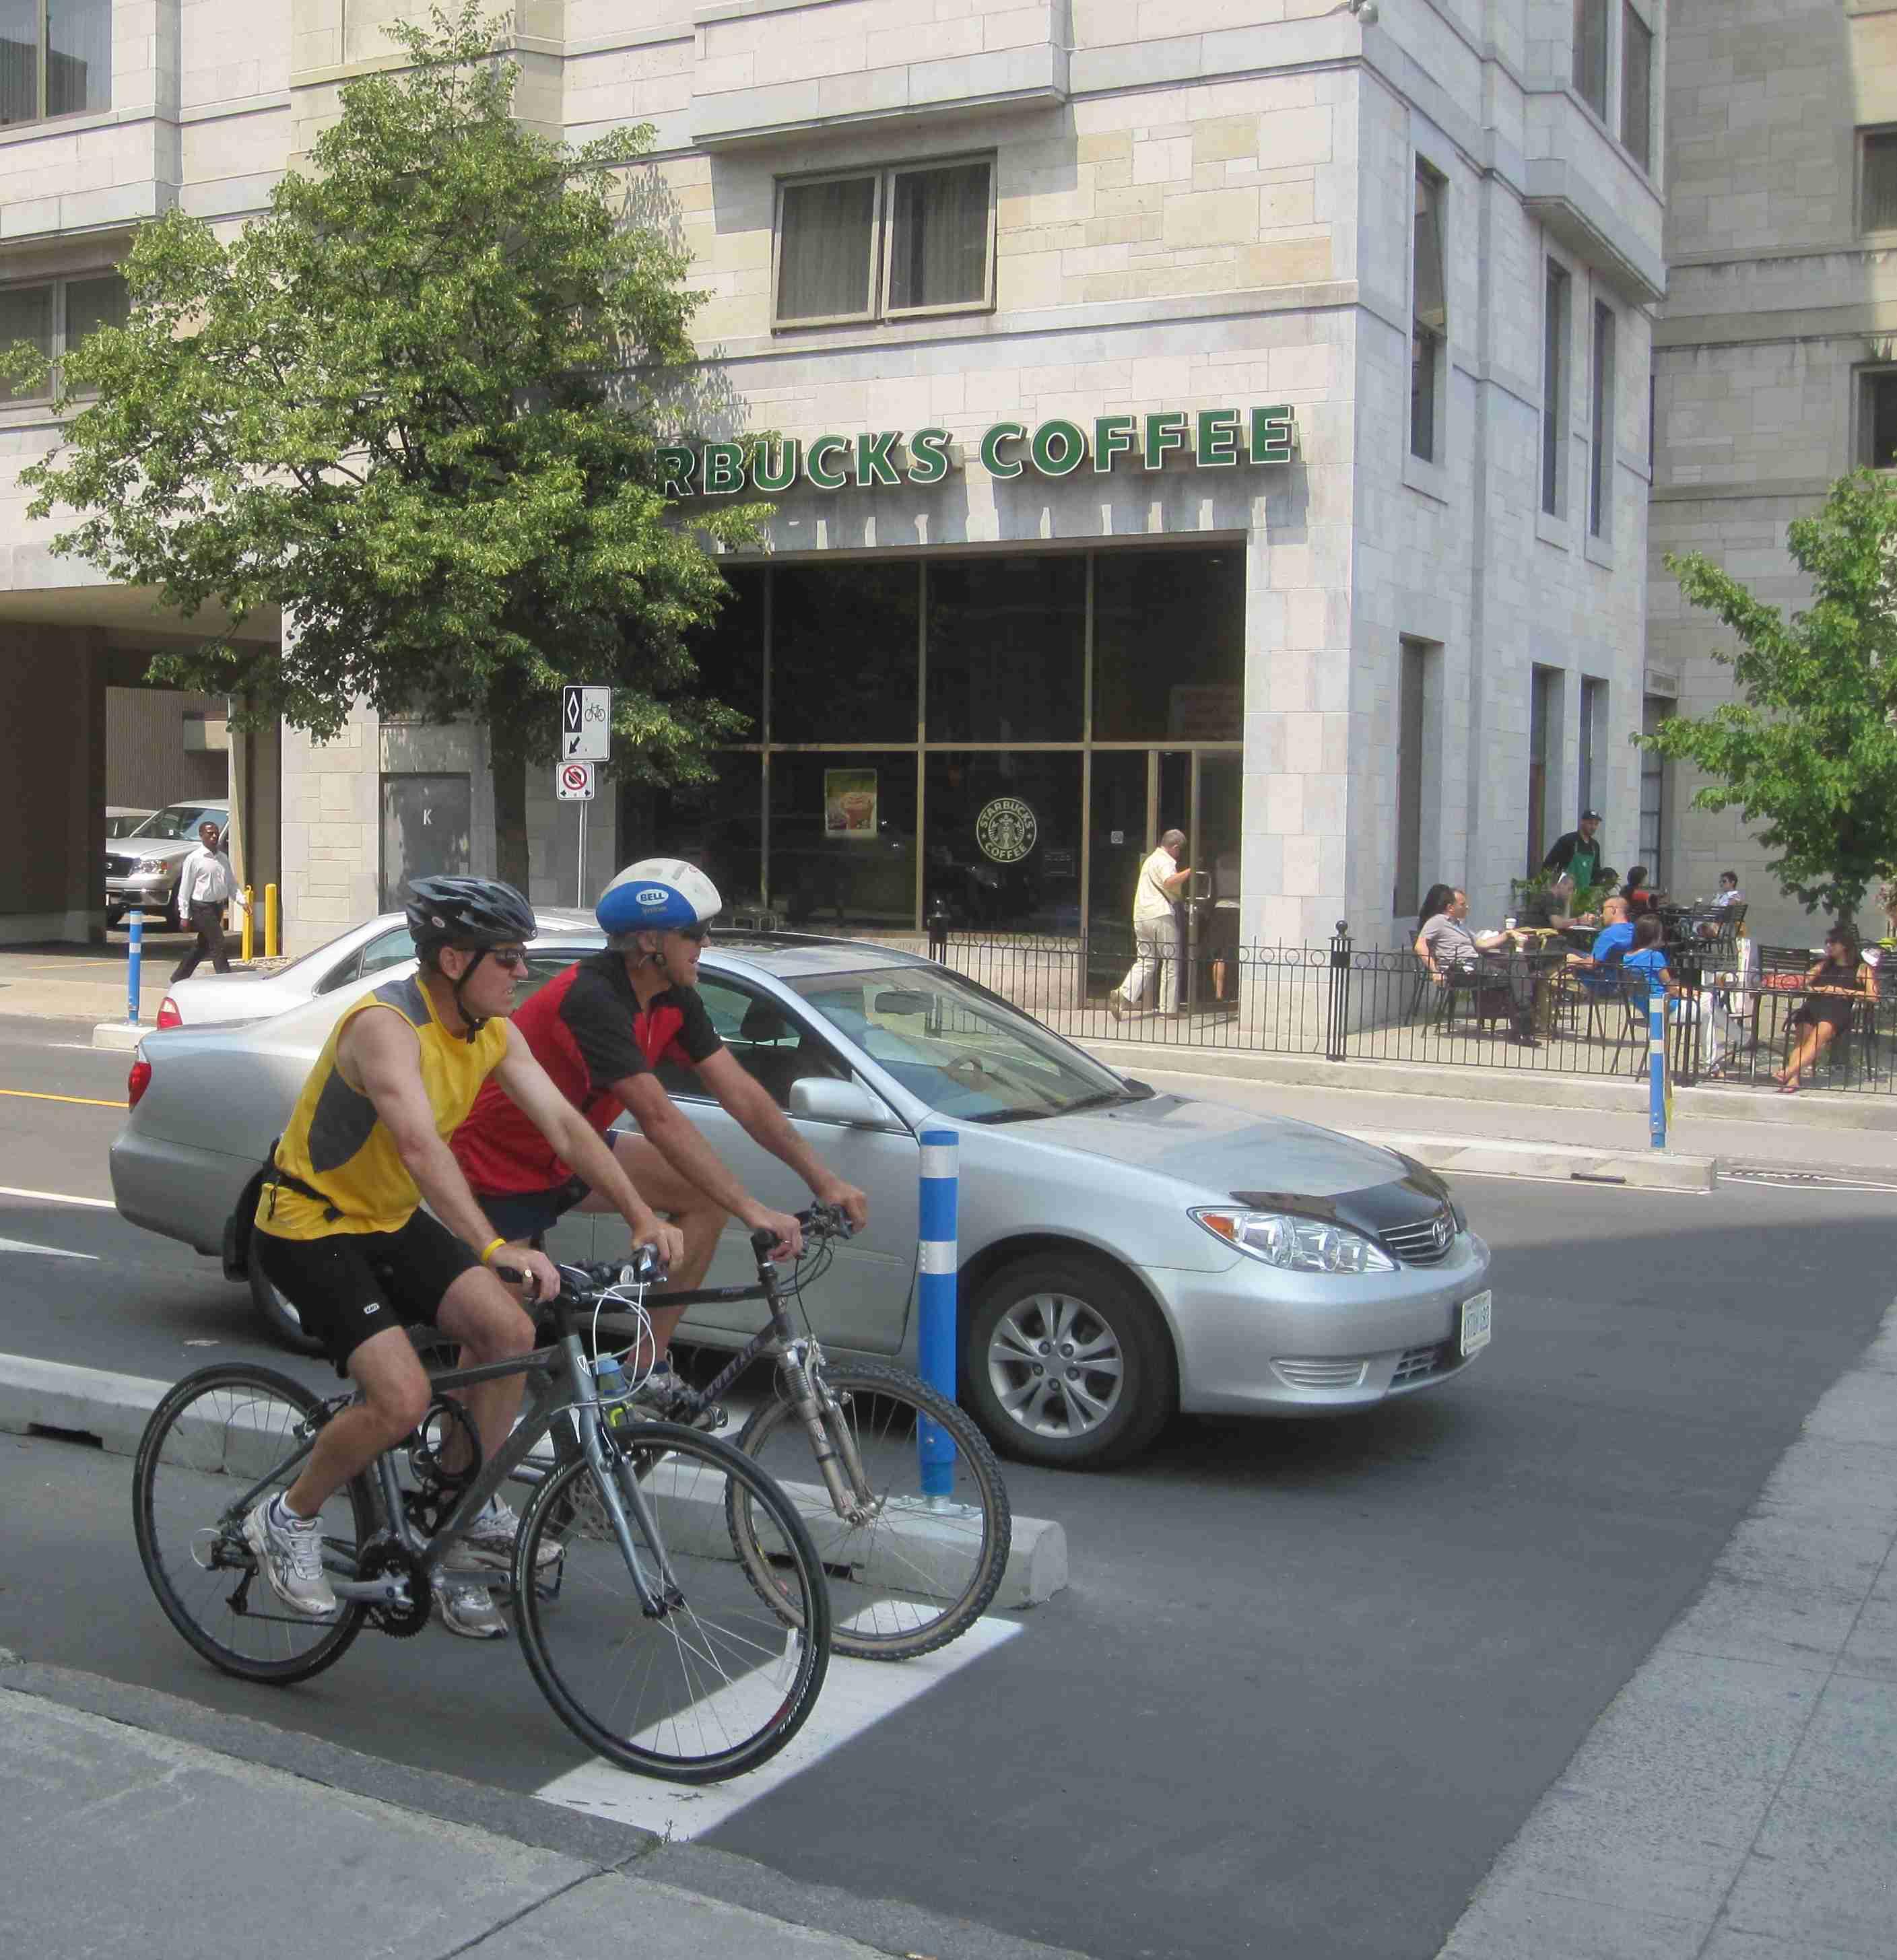 Ottawa Bicycle Culture – Starbucks